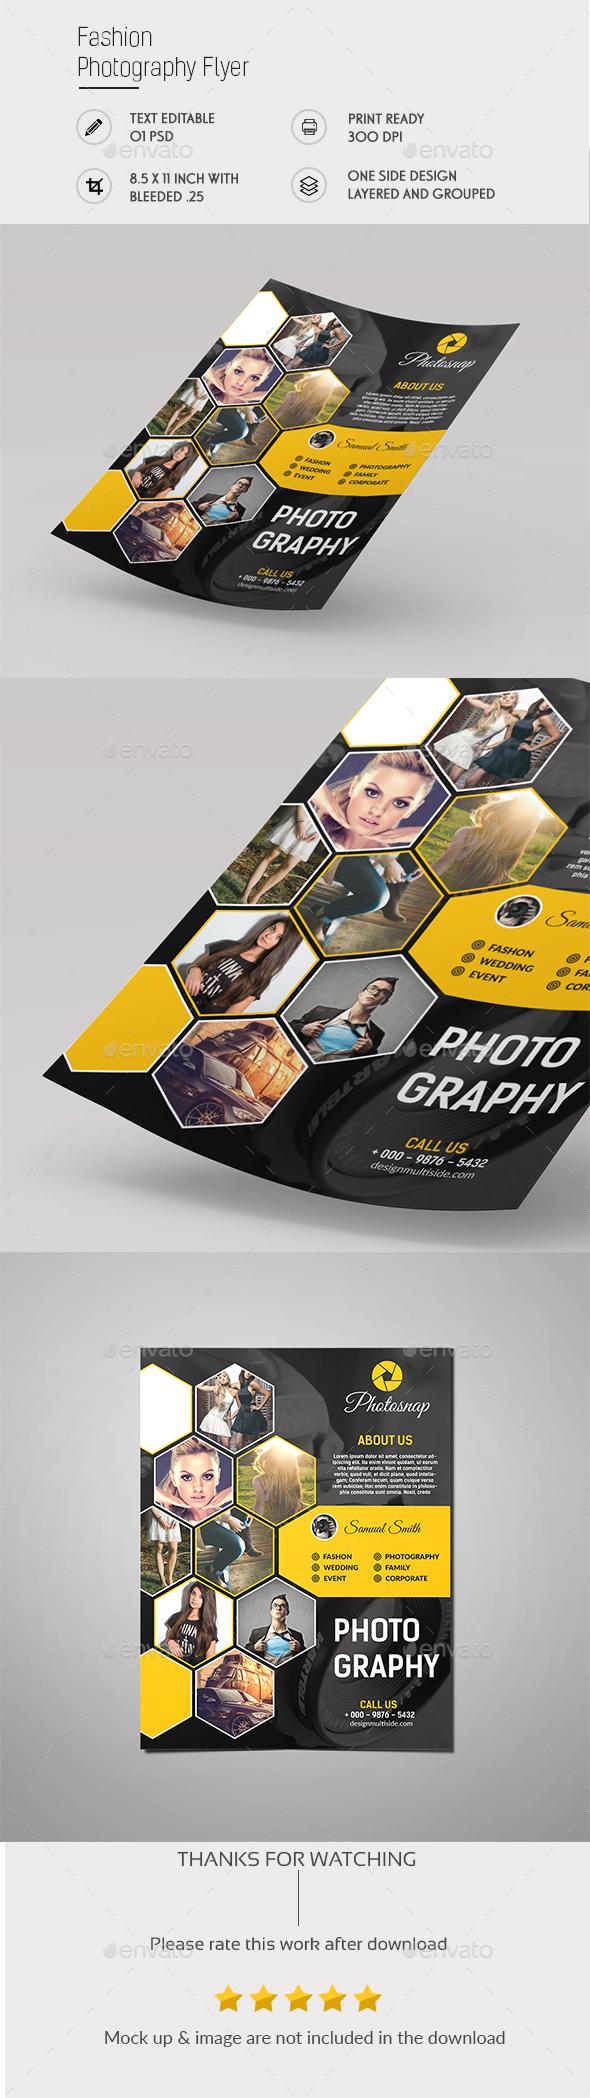 Fashion Photography Flyer - Flyers Print Templates